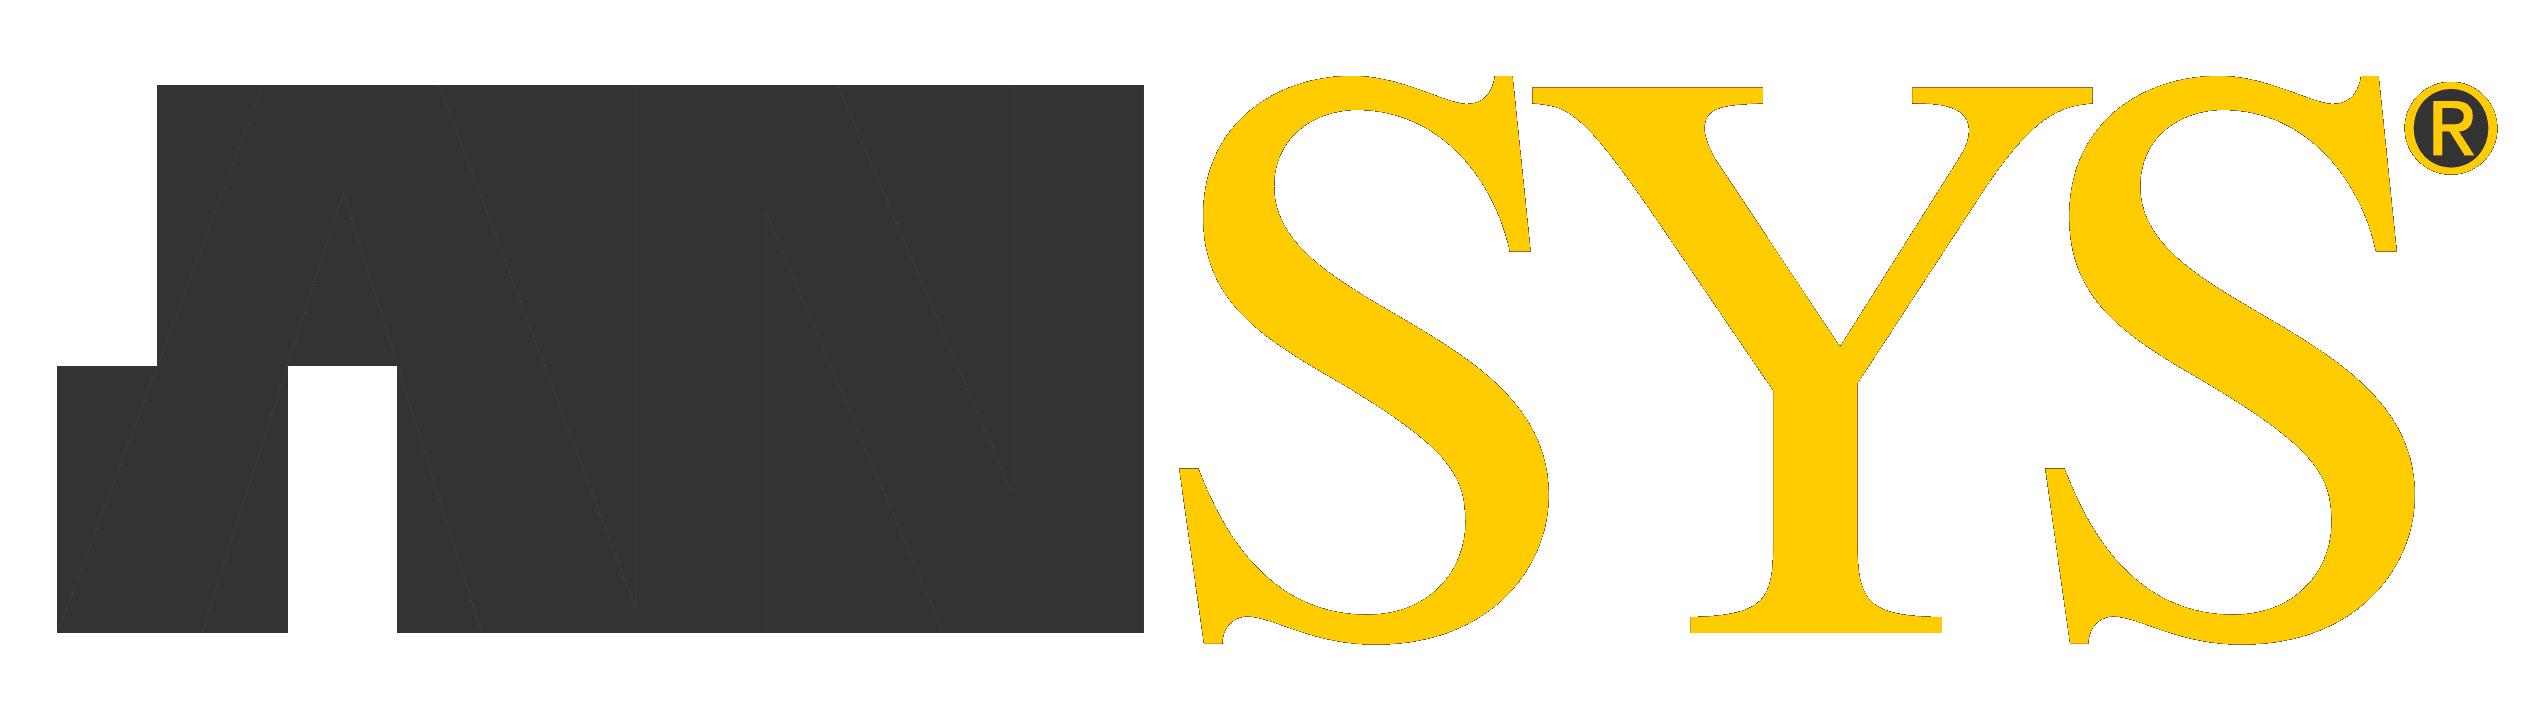 ANSYS_Logo | Editable Files